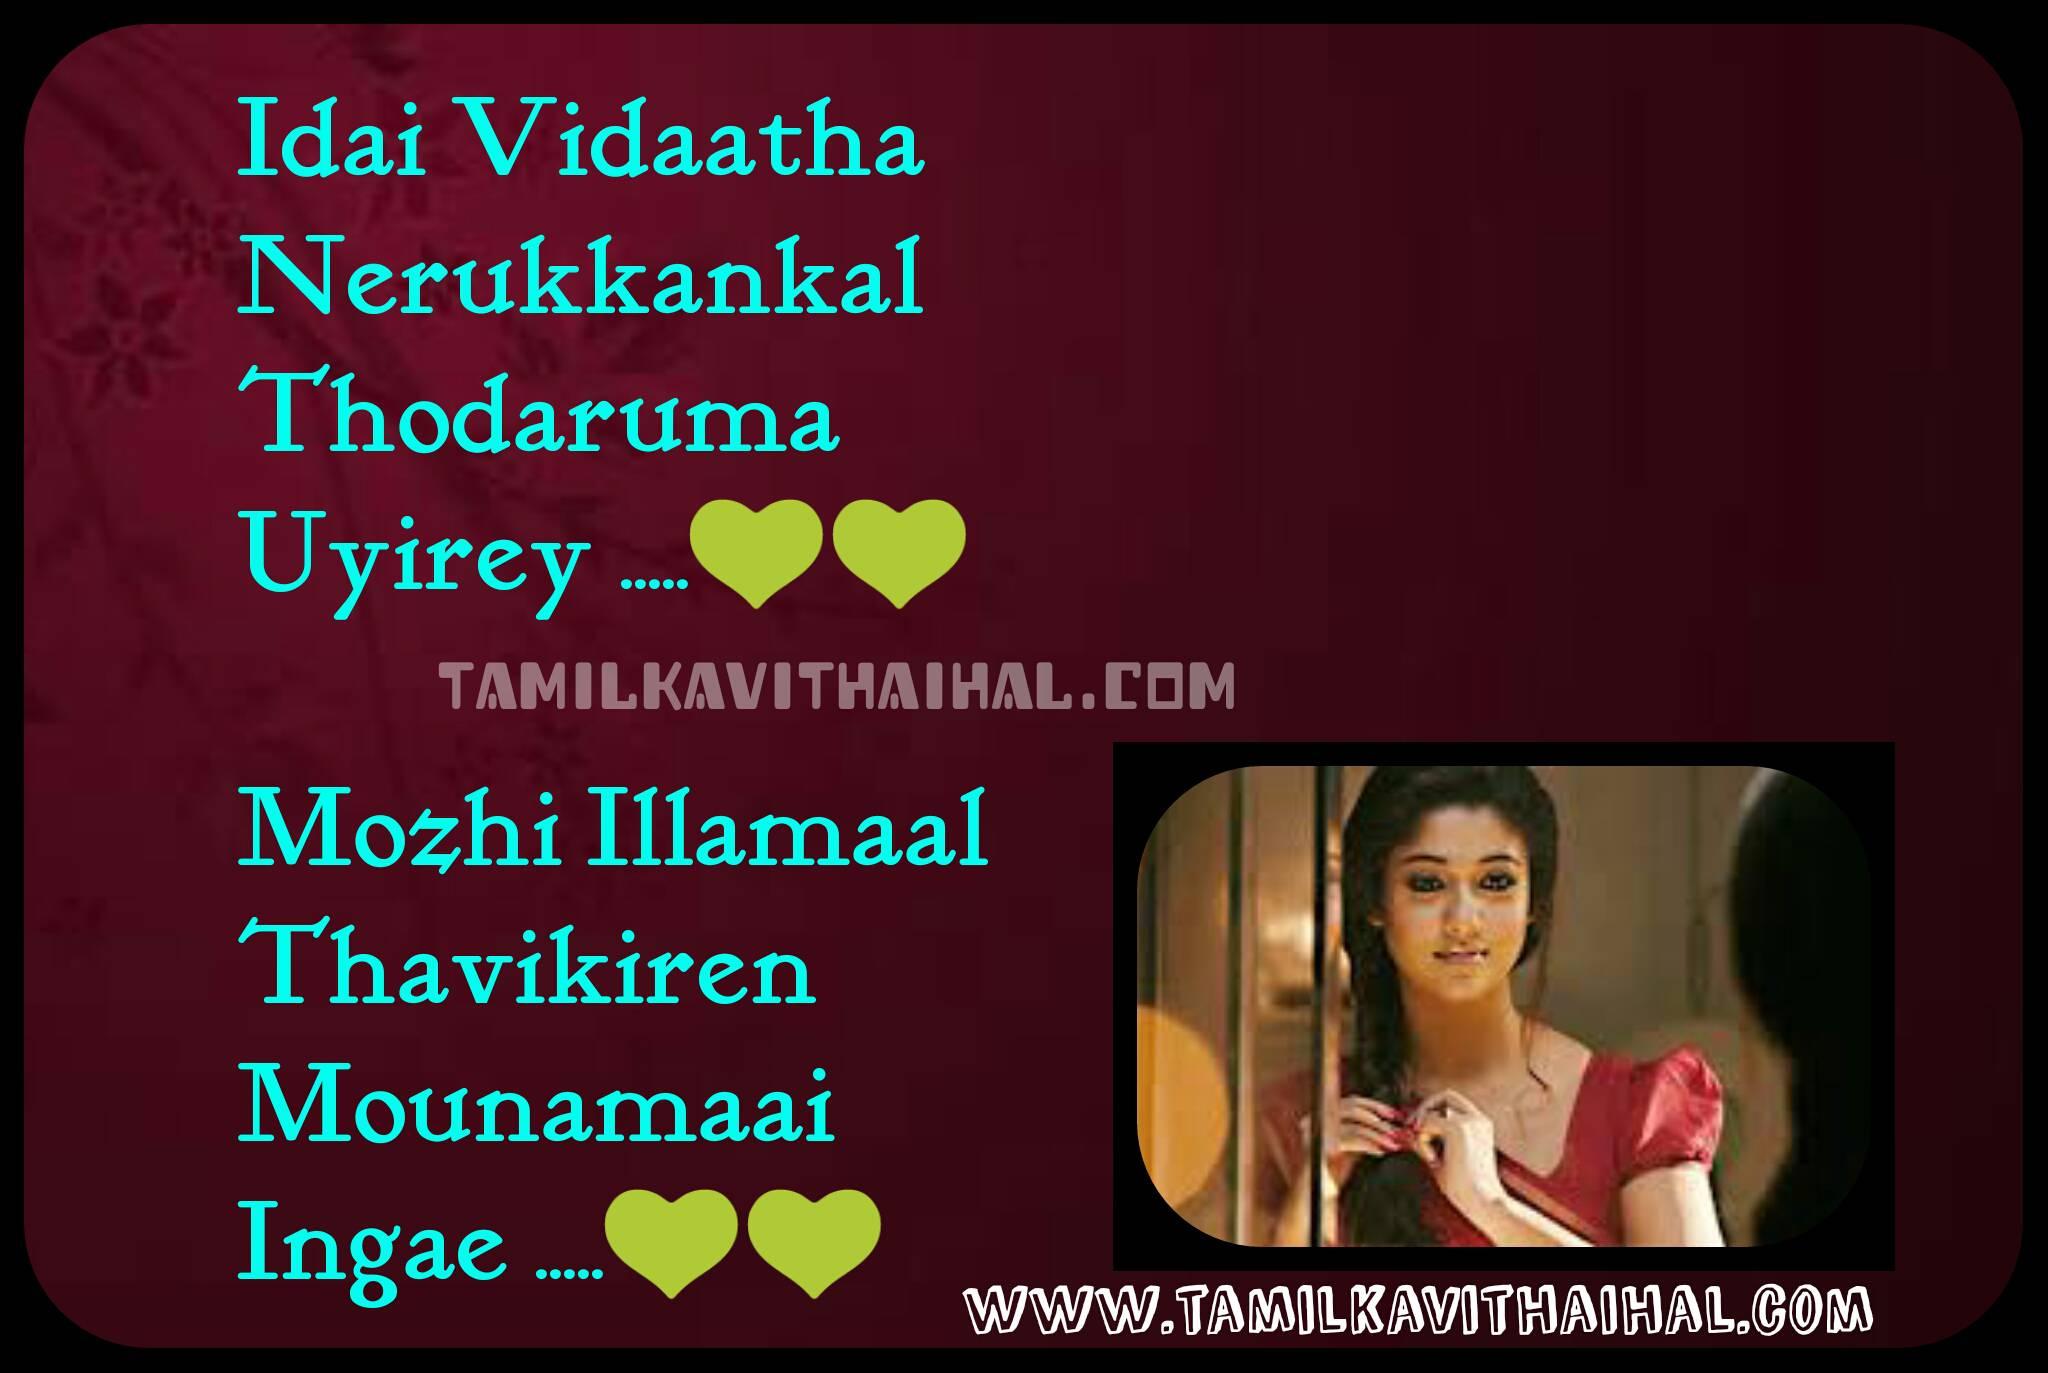 Awesome kadhal movie raja rani nayan aarya tamil song unnaley in english lines girl love proposal image